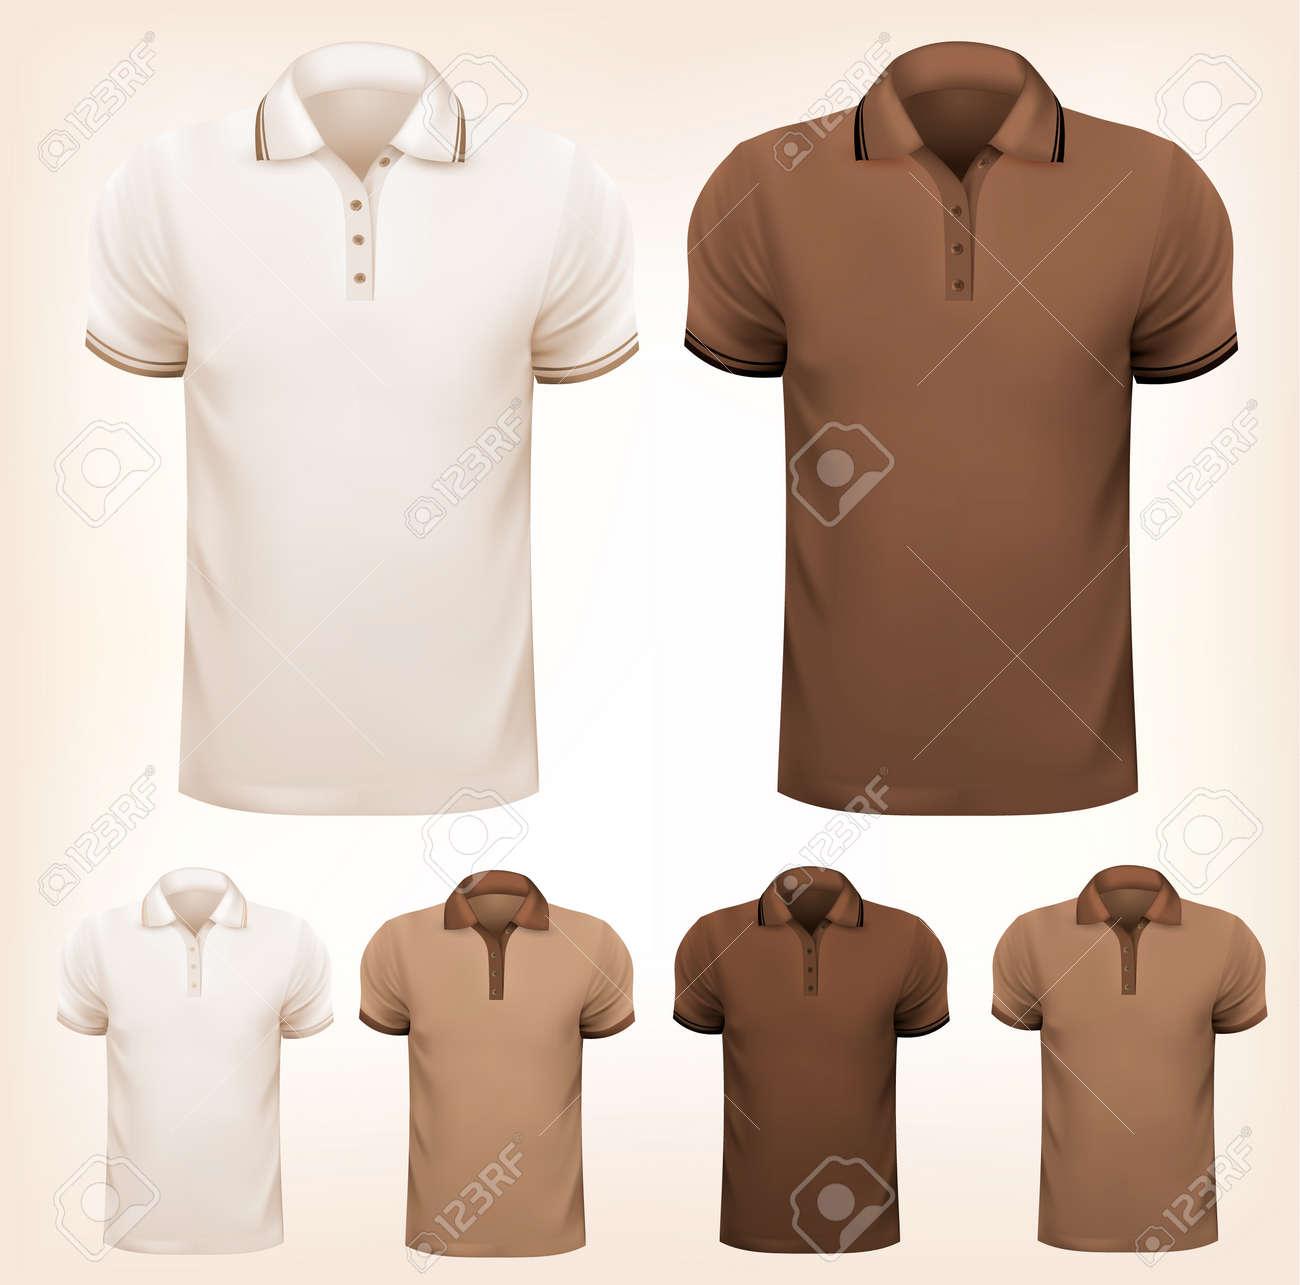 Retro set of colorful men t-shirts  Design template  Vector illustration Stock Vector - 23701928